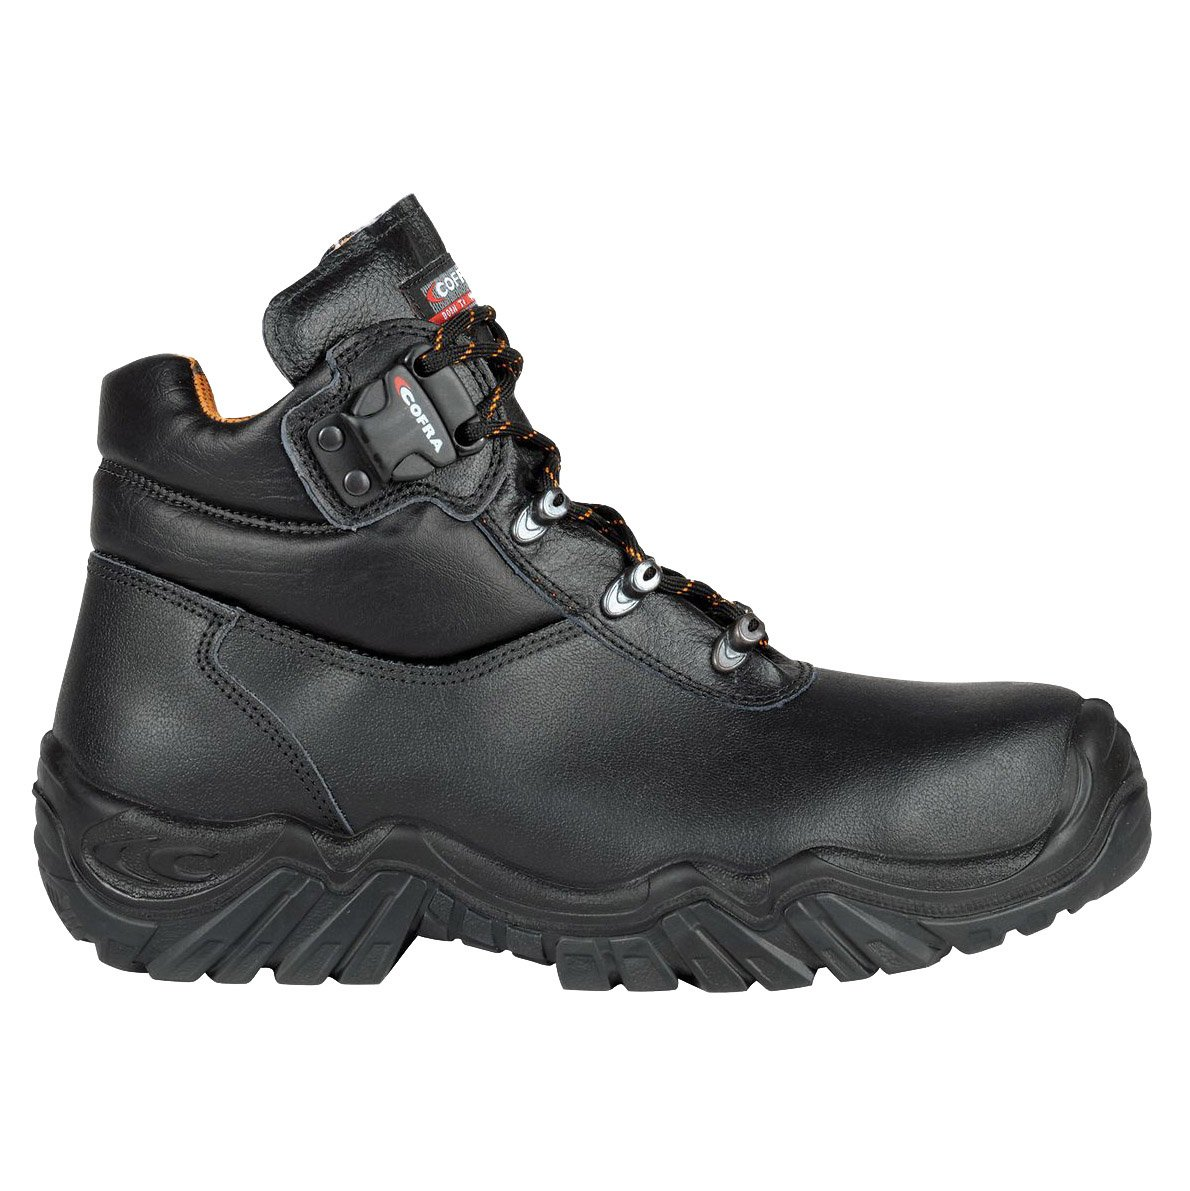 Cofra 80470– 000.w46 Gr. 46 S3 Hi CI HRO SRC'K2' Sicherheit Schuhe –  Schwarz 80470-000.W46